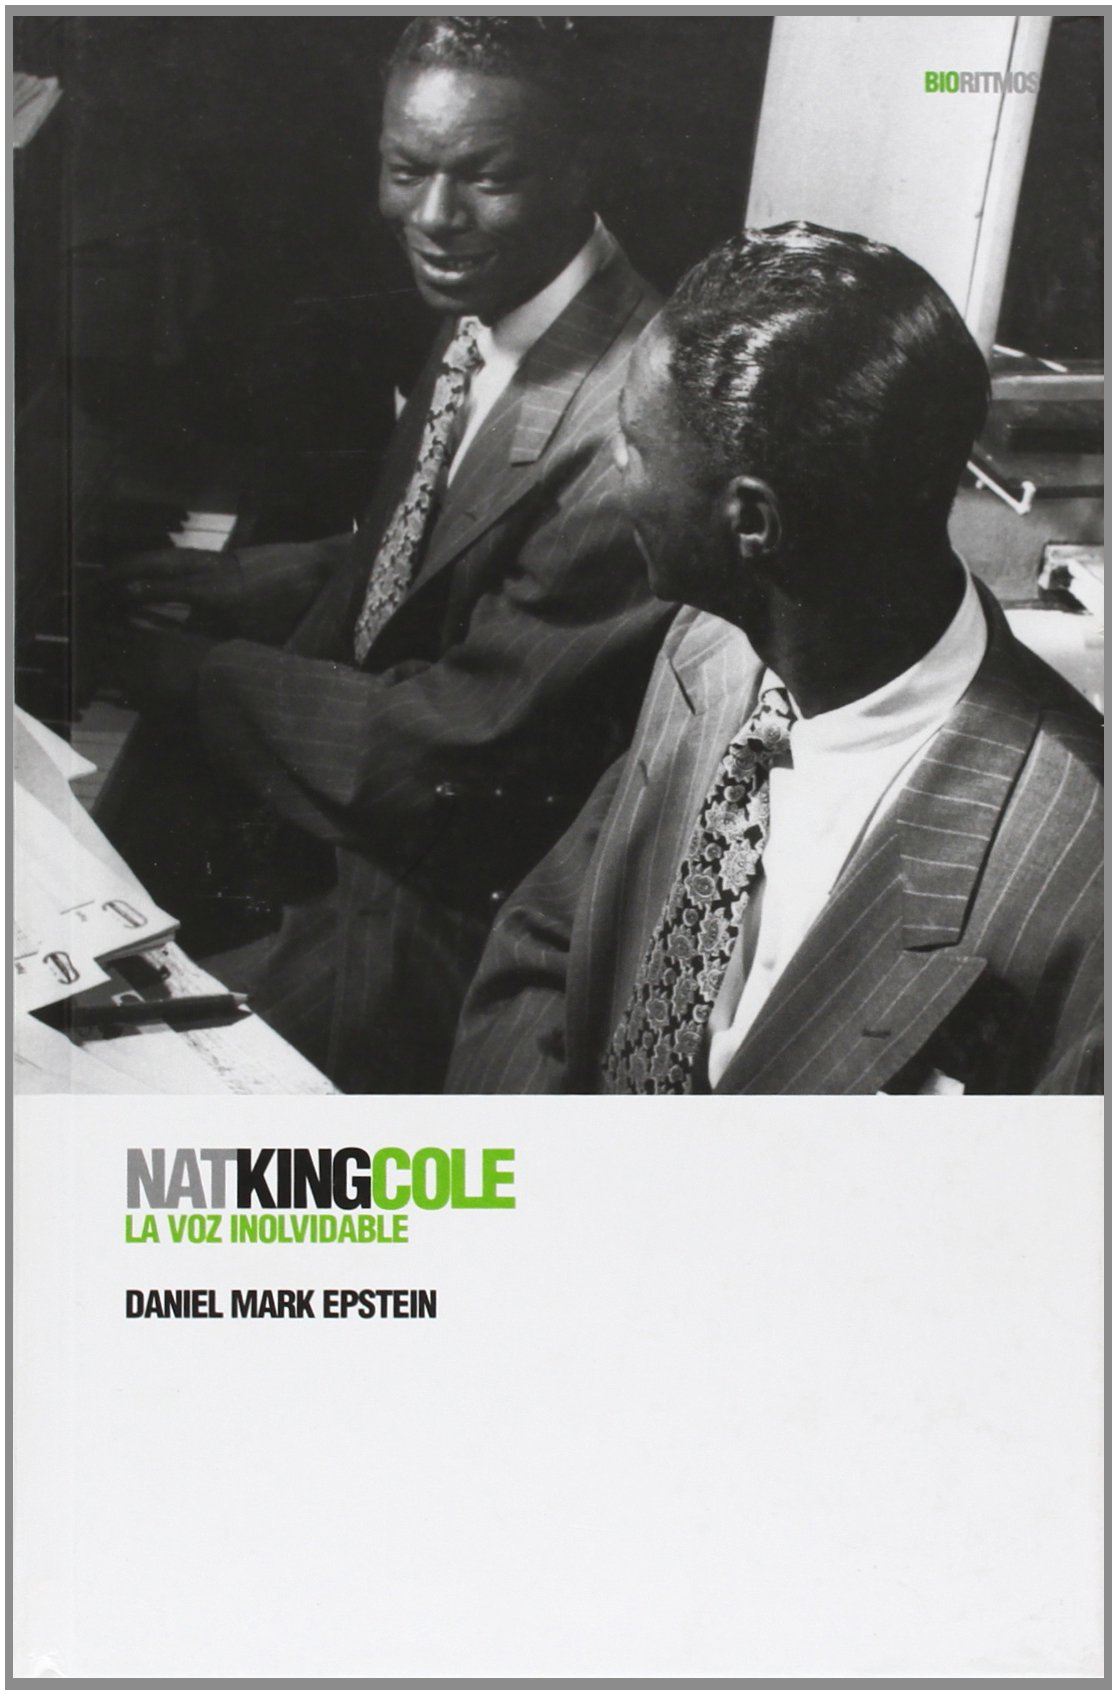 Nat King Cole: La voz inolvidable (Biorritmos) (Spanish Edition)